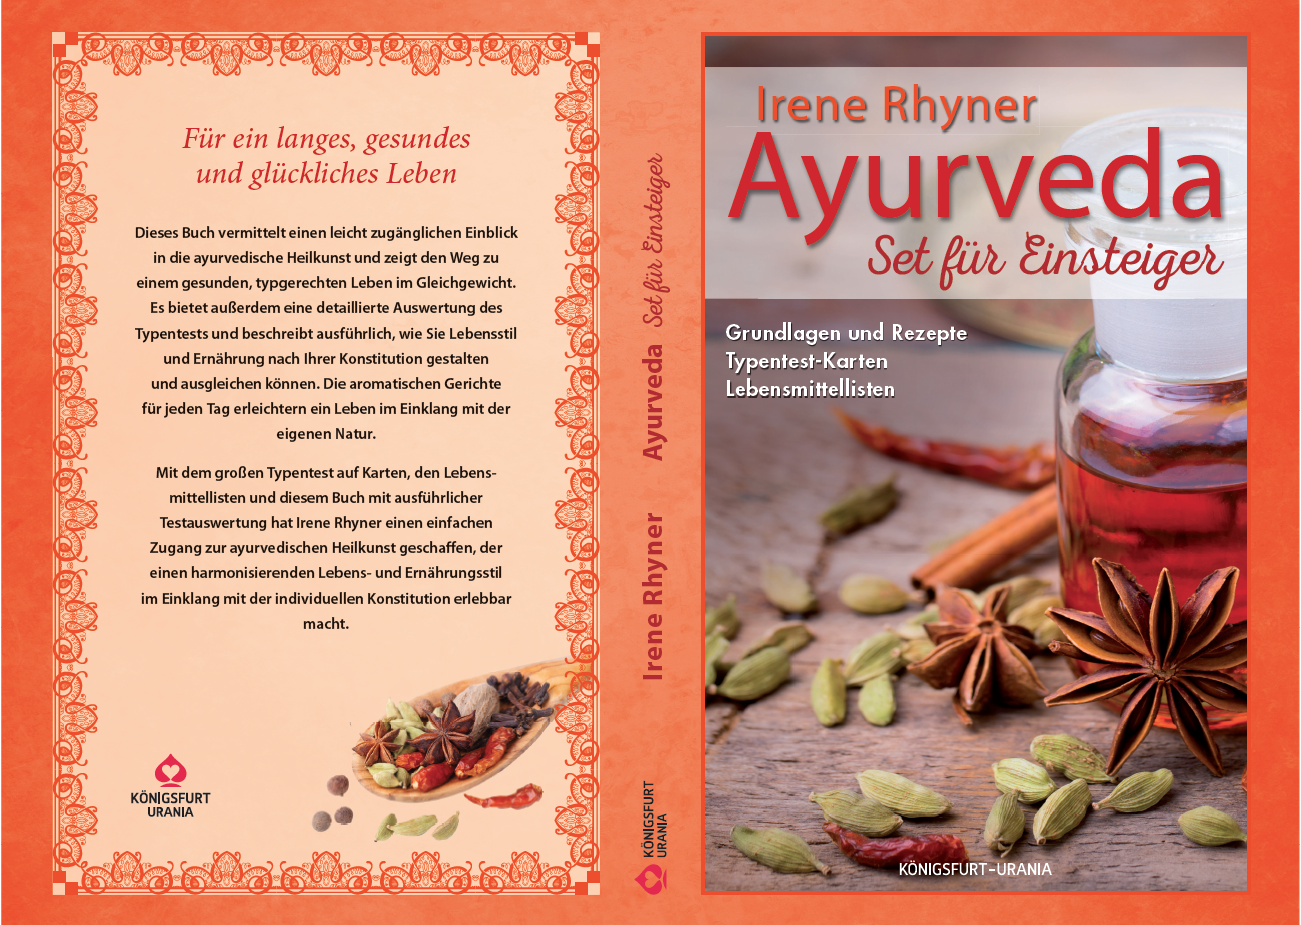 Ayurveda Fachbücher - AYURVEDA RHYNER® - EU / Ayurveda Web Shop